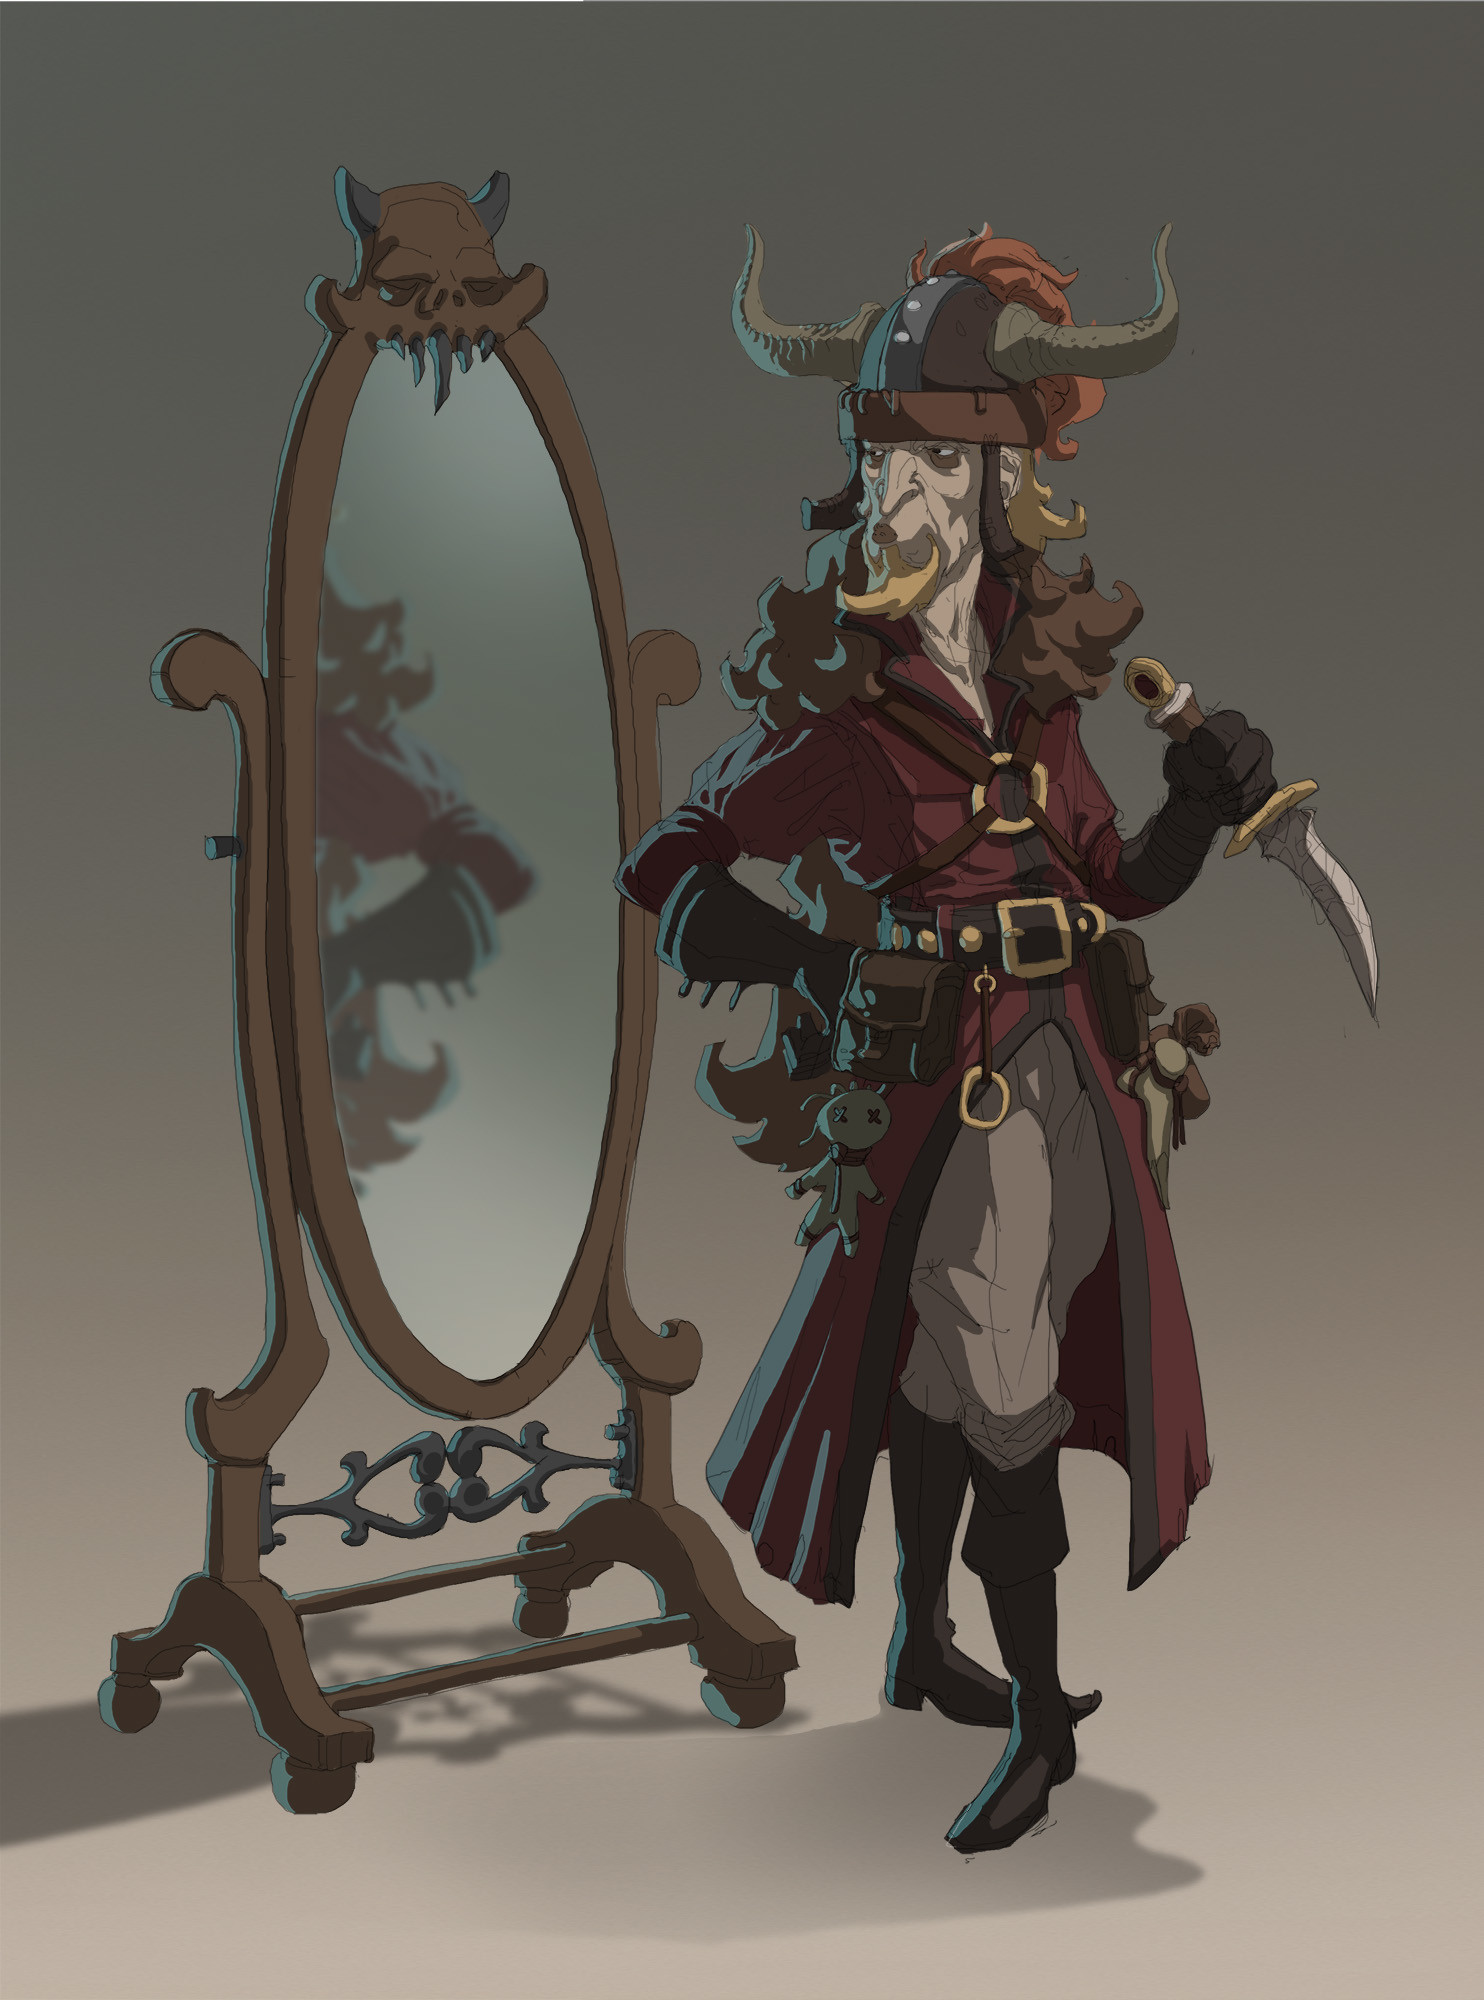 Jason borne character customizationc